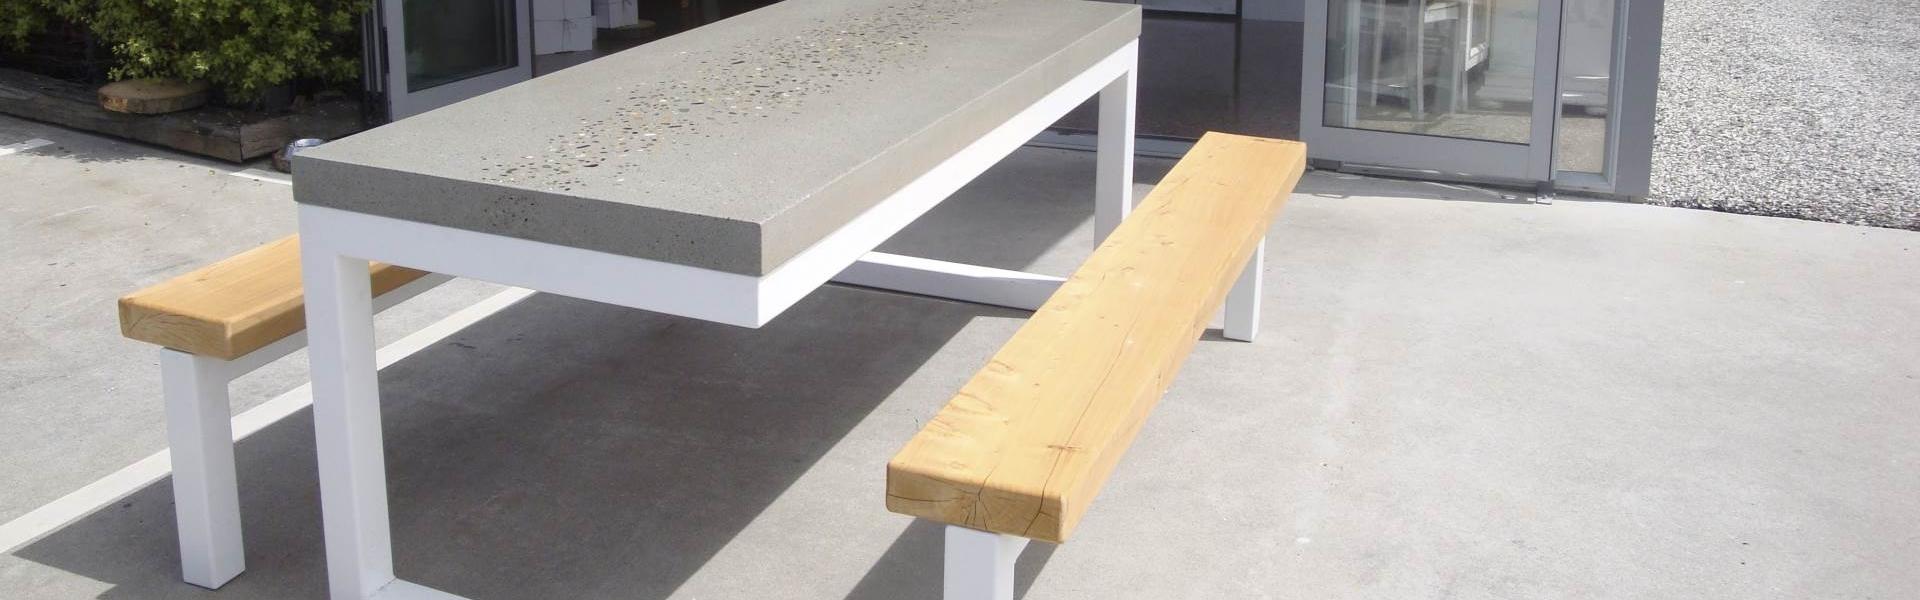 outdoor concrete table